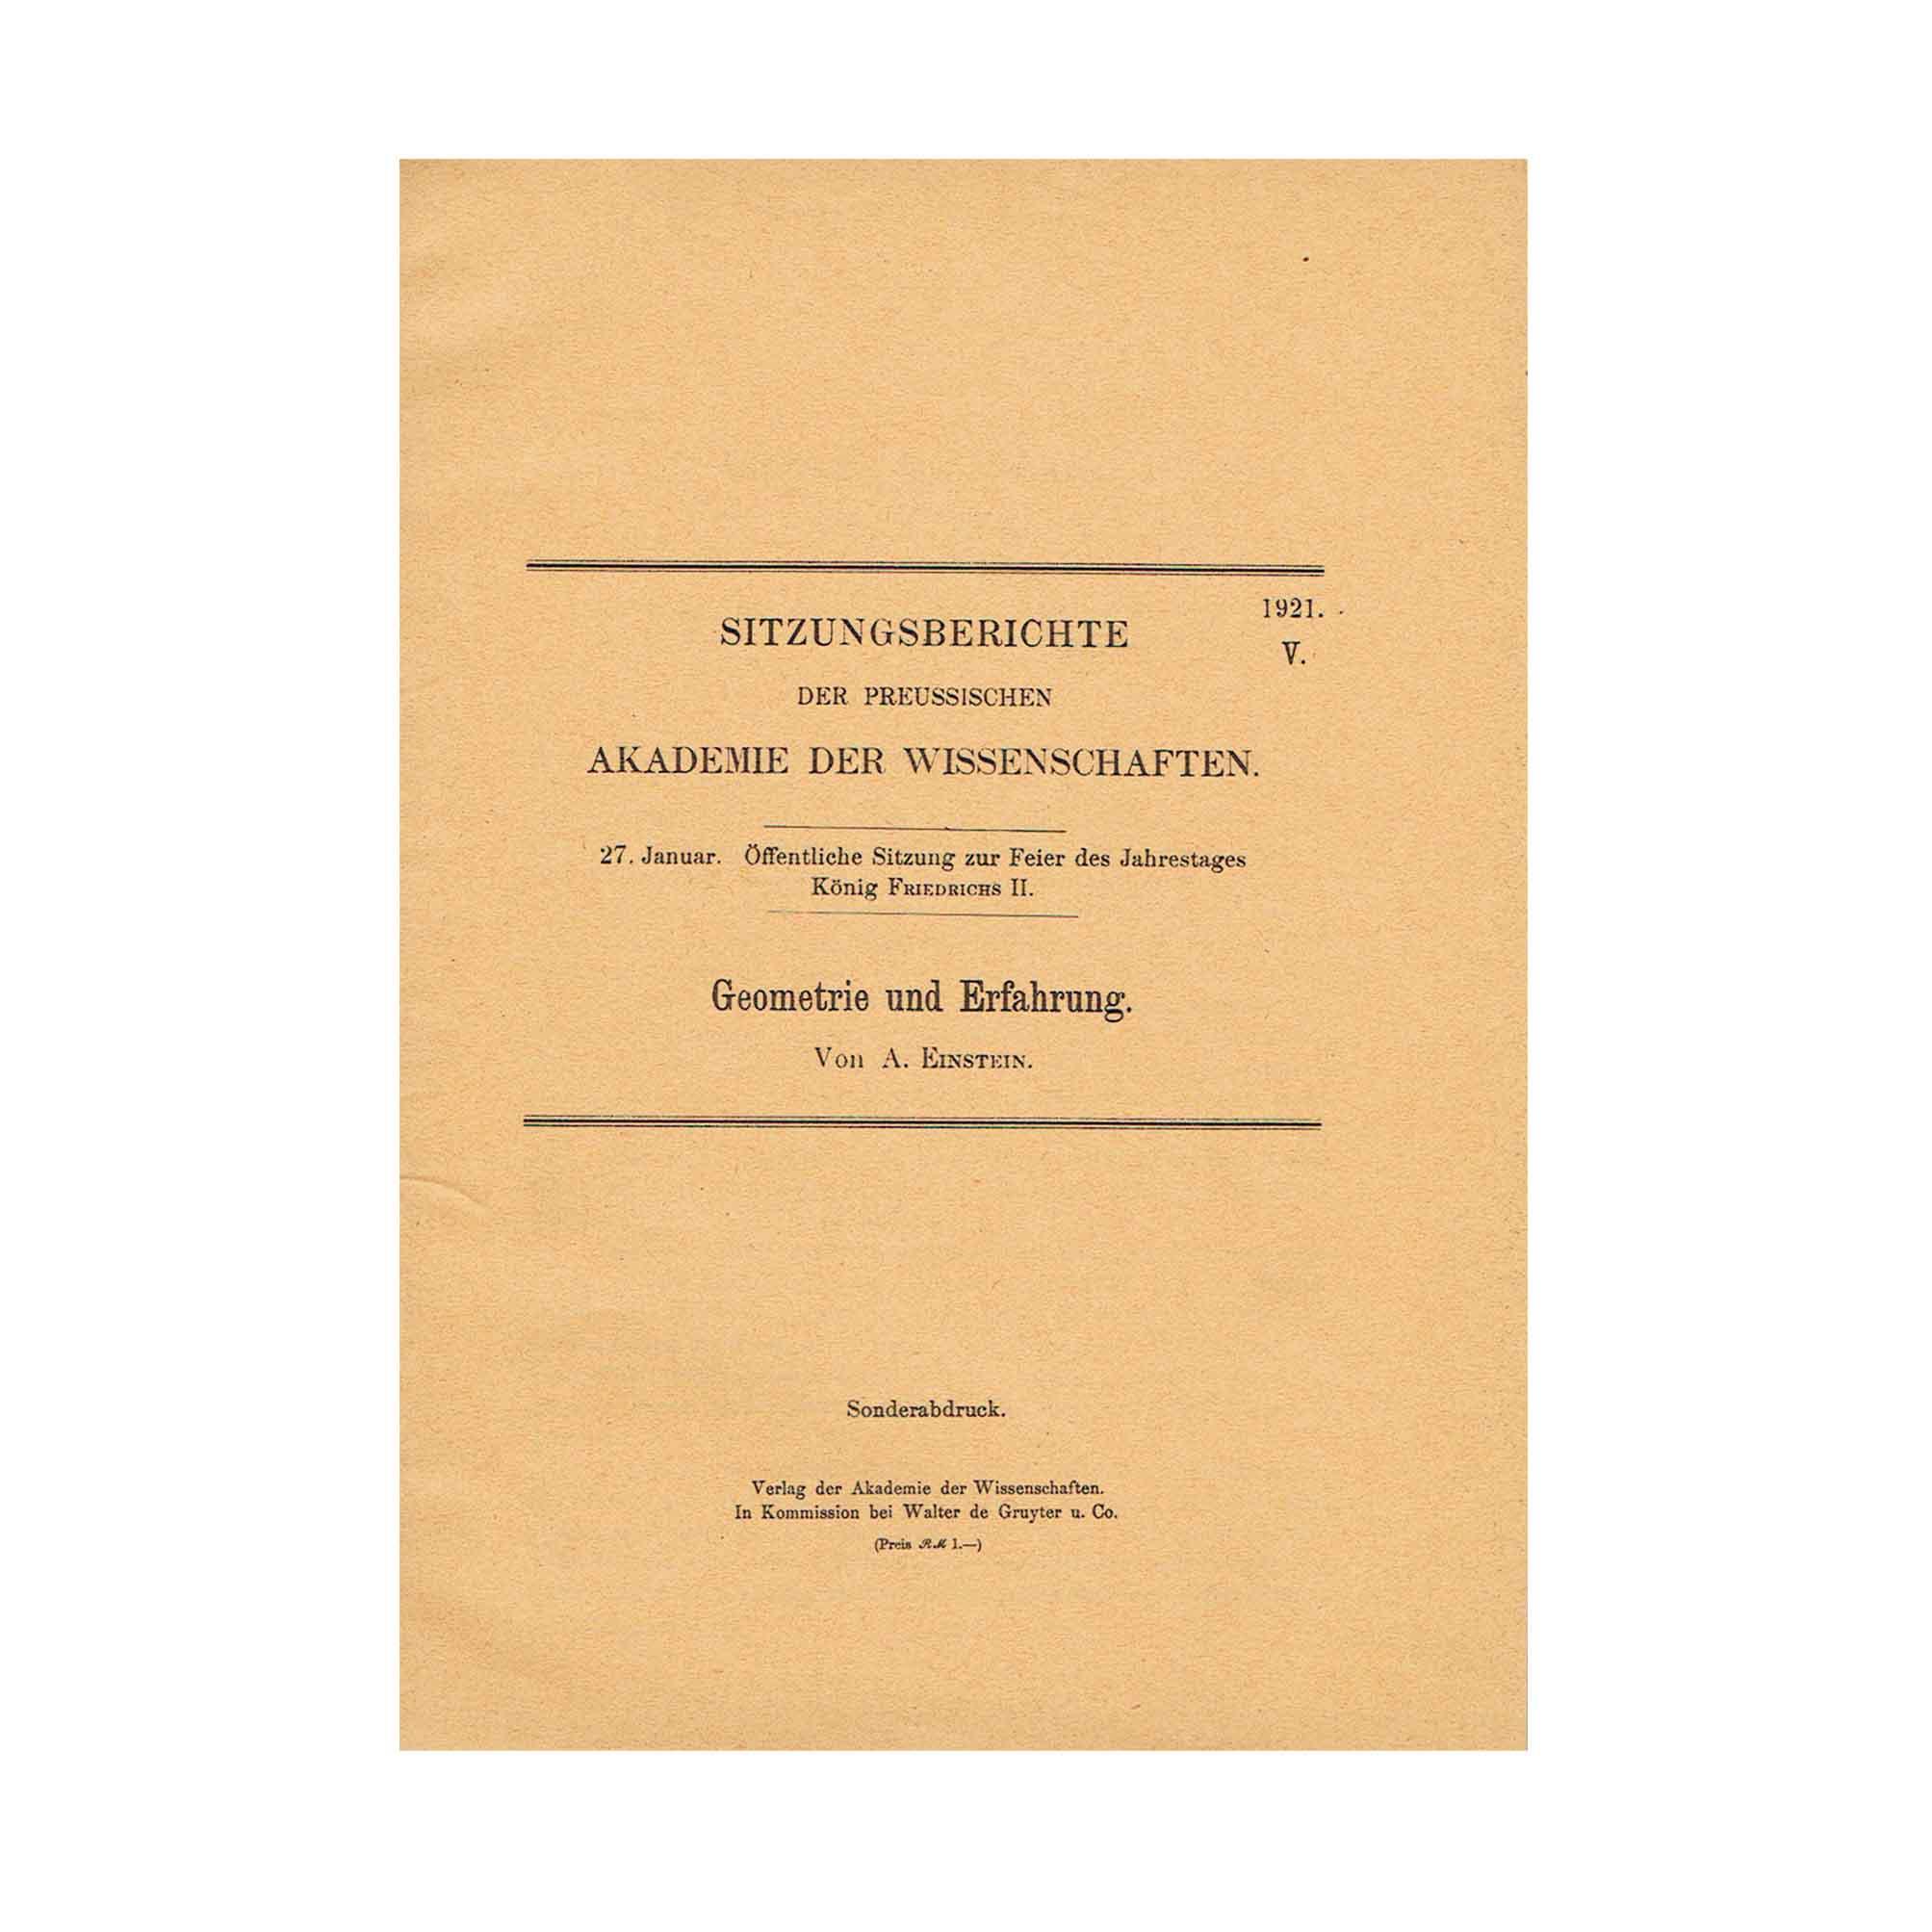 5726-Einstein-Geometry-Experience-Akademie-V-1921-SA-Cover-recto-N.jpg